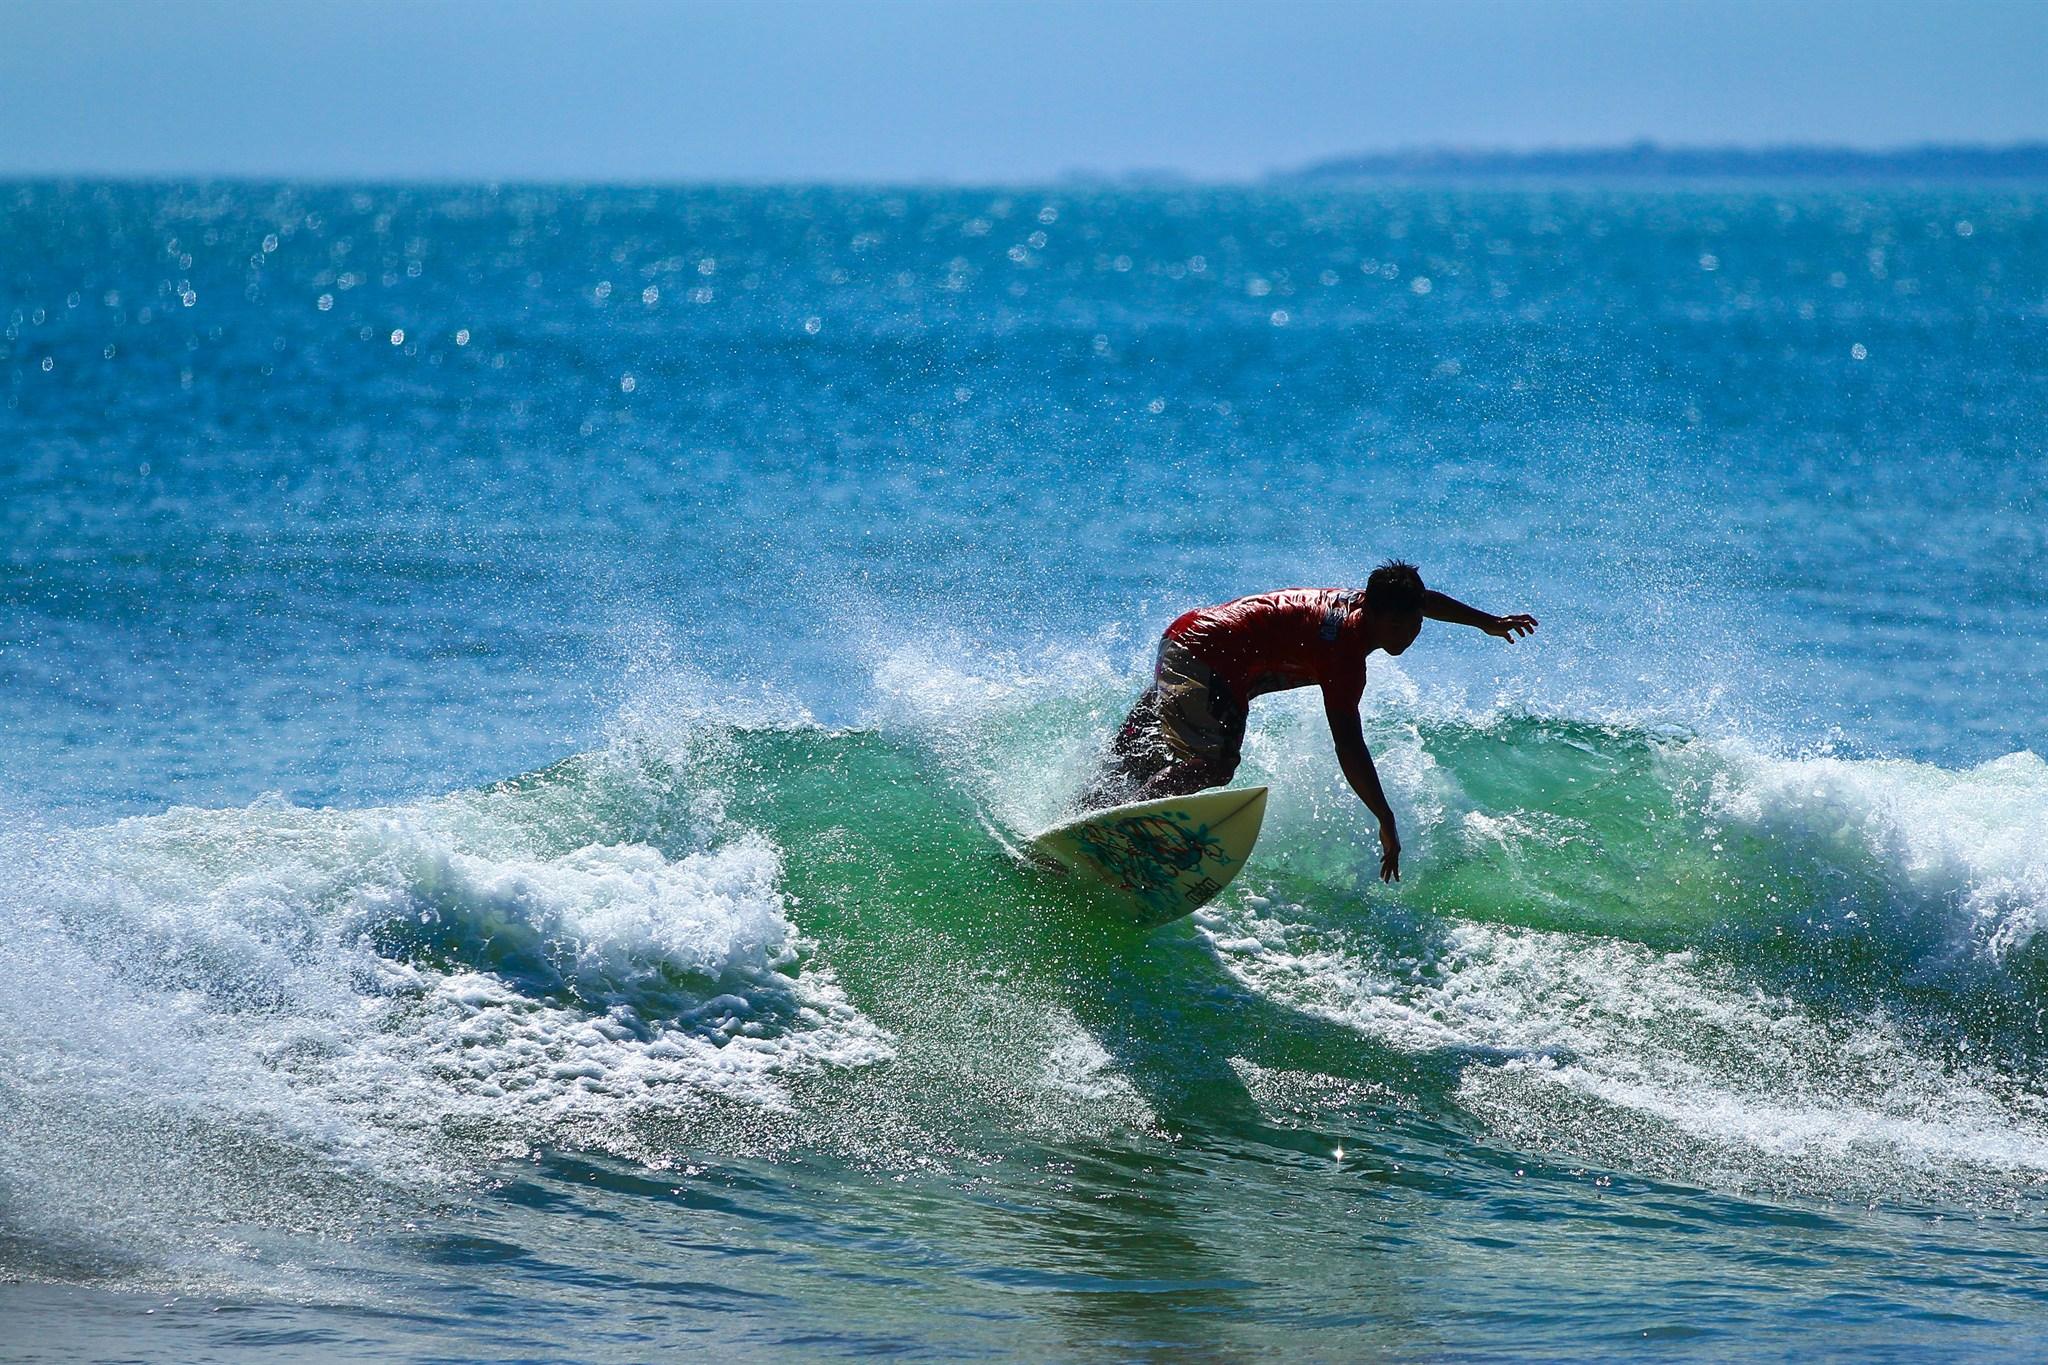 Kuta_Indonesia_Surfer.jpg